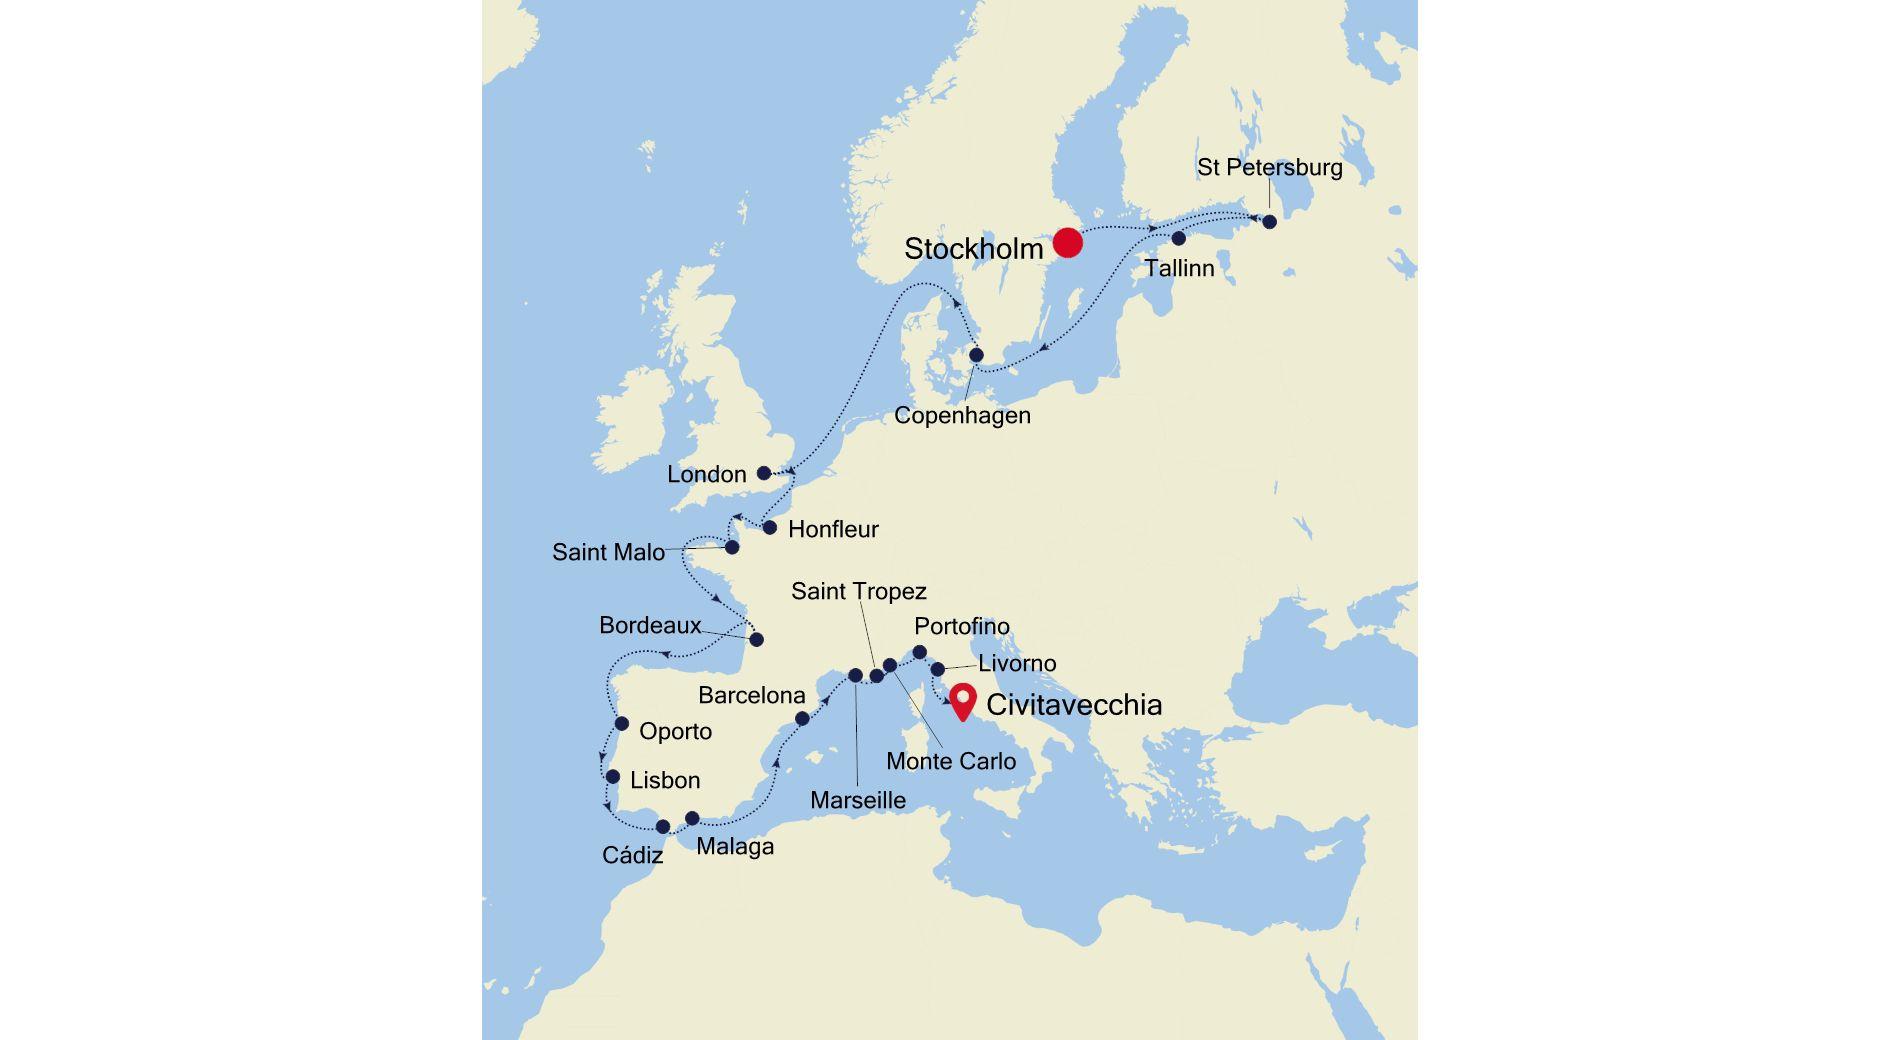 Luxury Cruise from STOCKHOLM to ROME (Civitavecchia) 28 Aug ...